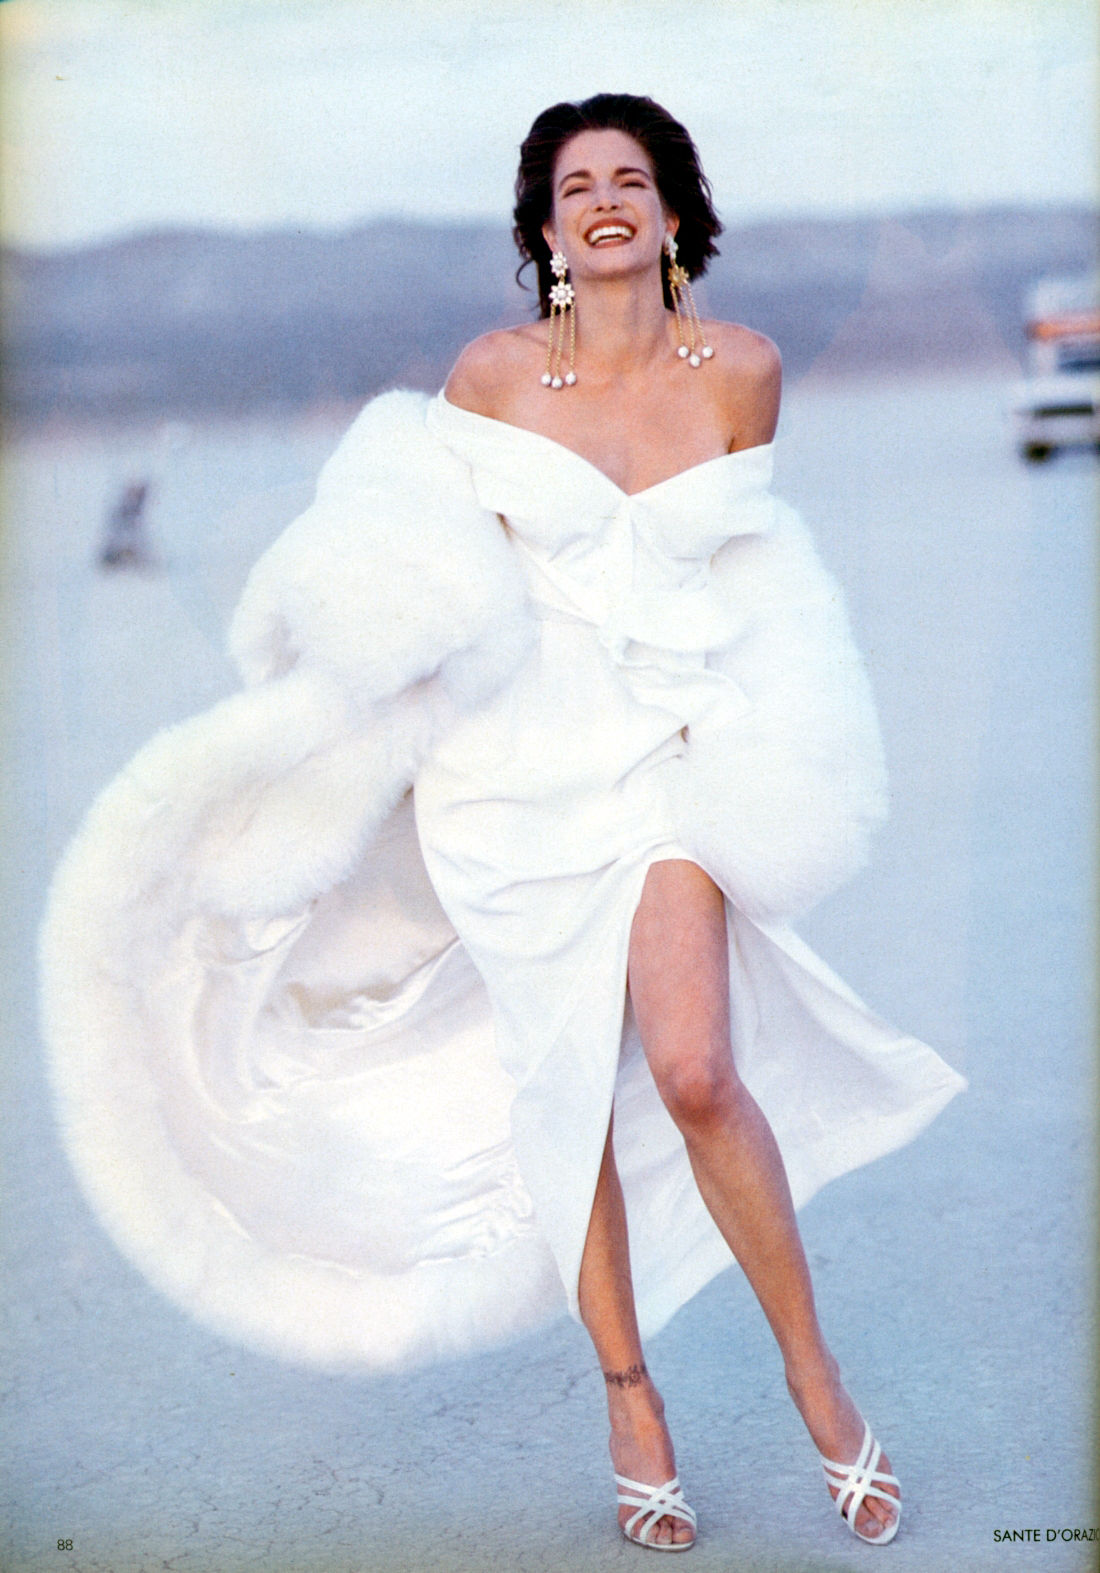 Vogue (UK) July 1990 | Stephanie Seymour 05.jpg